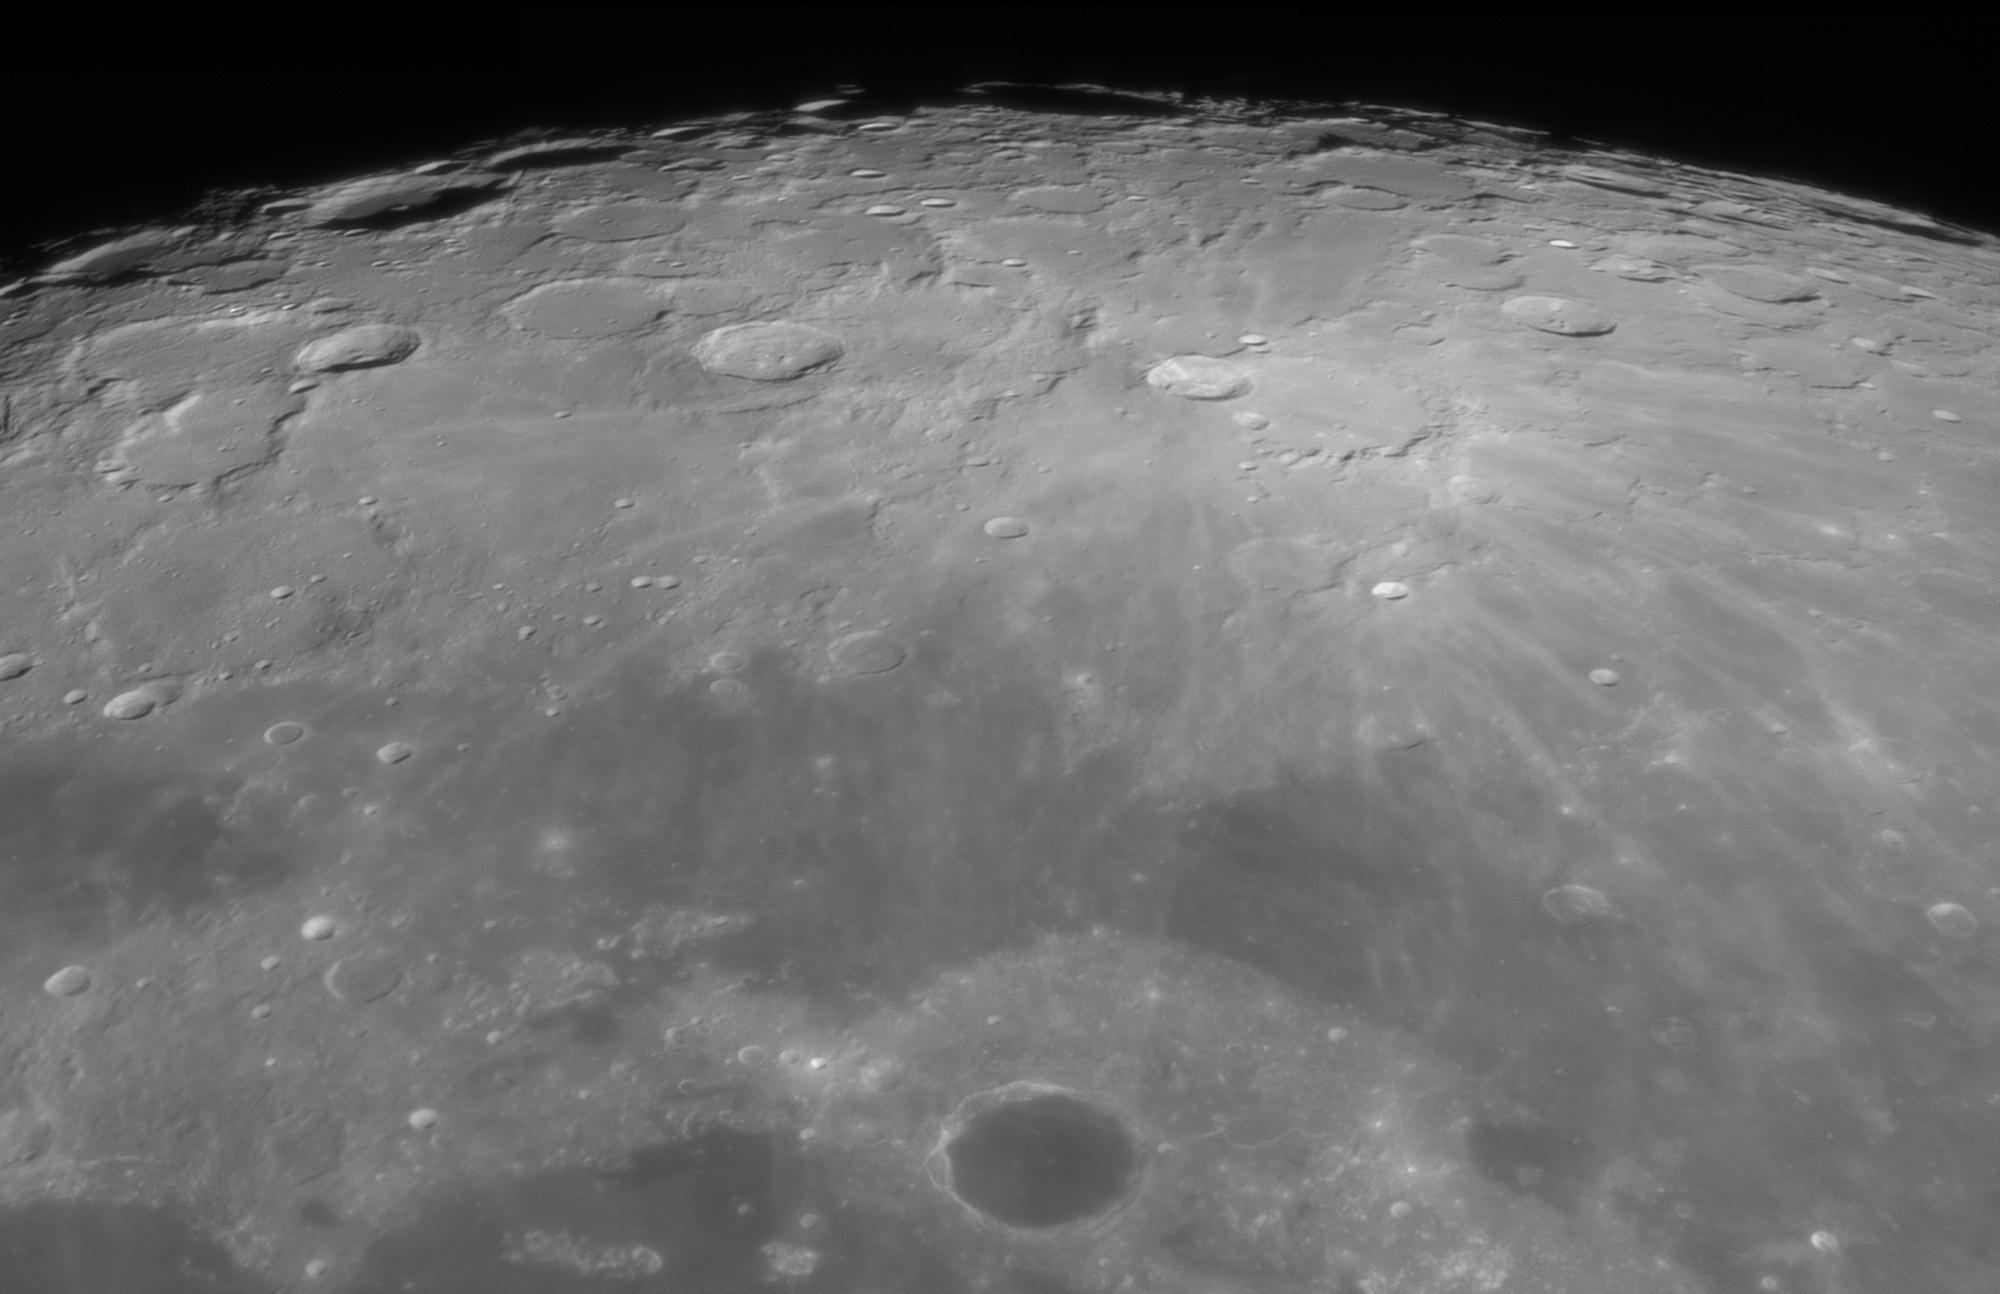 lune2.thumb.jpg.9d5b246fbda0a95c609e1c29e7a8eba9.jpg